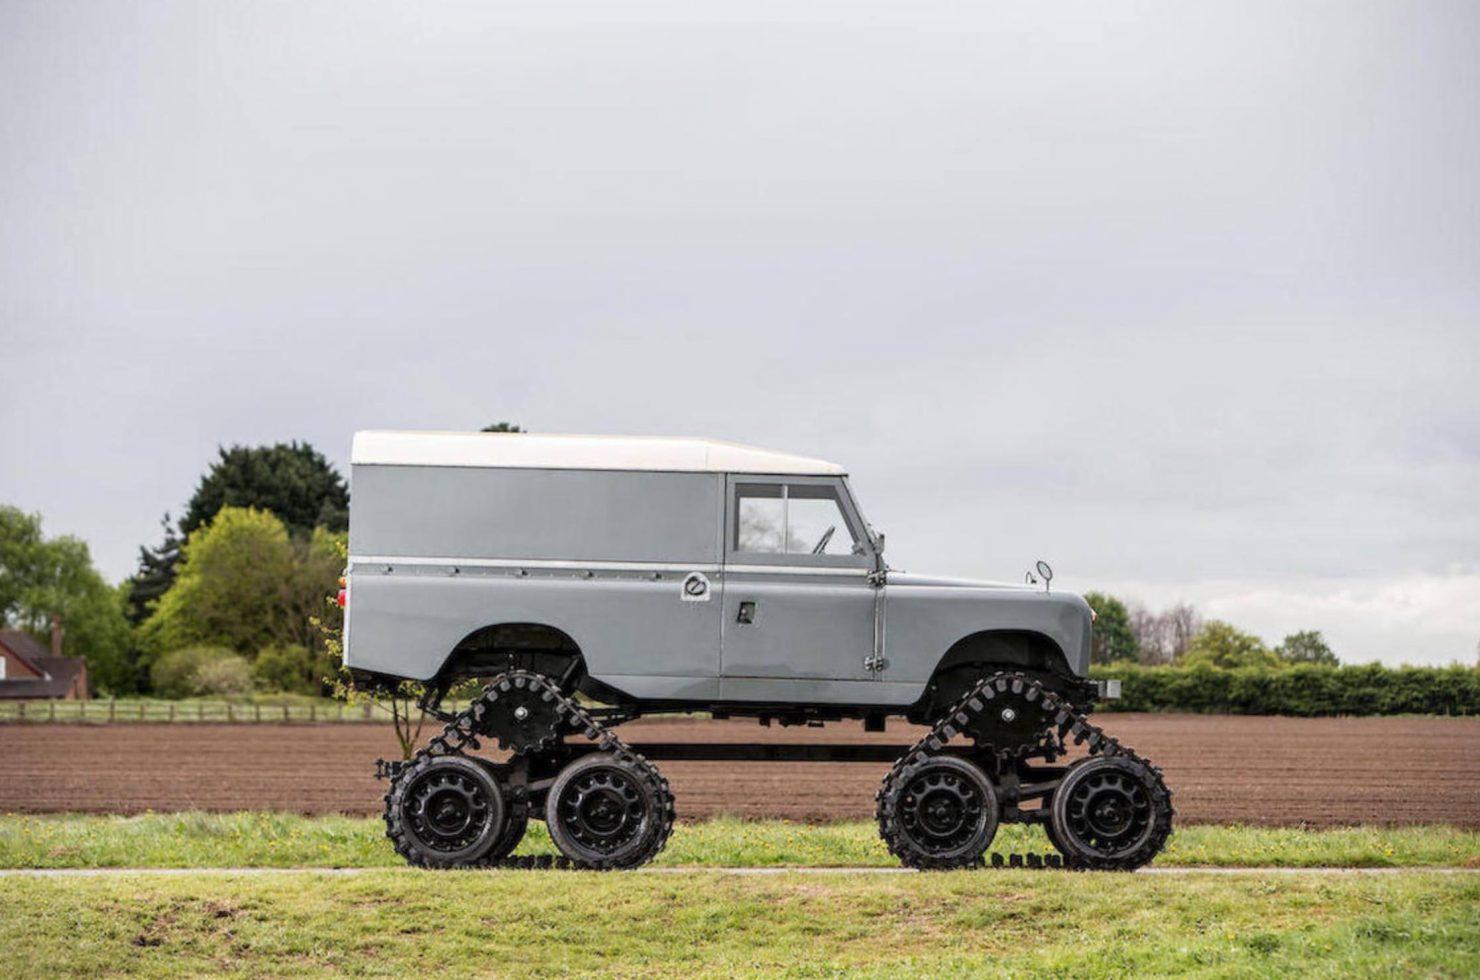 land rover Cuthbertson 6 1480x980